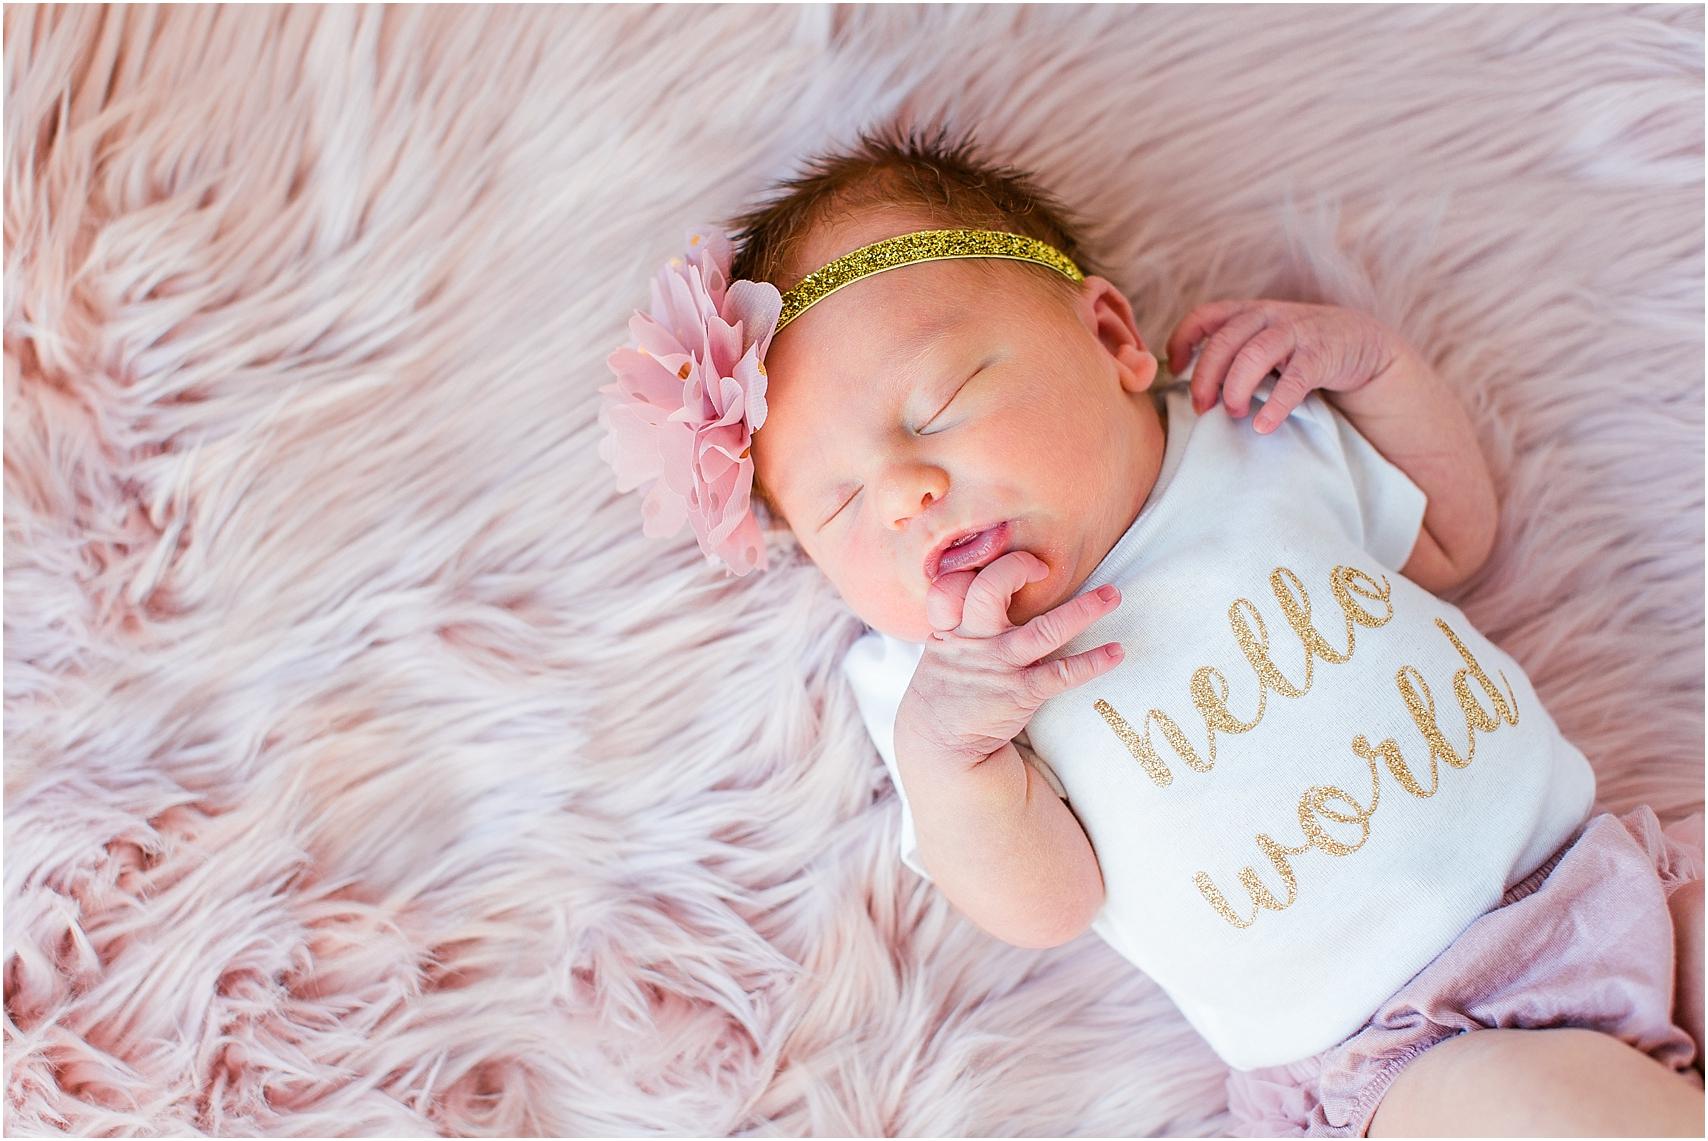 Minnesota Lifestyle In Home Newborn Photography Session Eagan Newborn Photography_0004.jpg